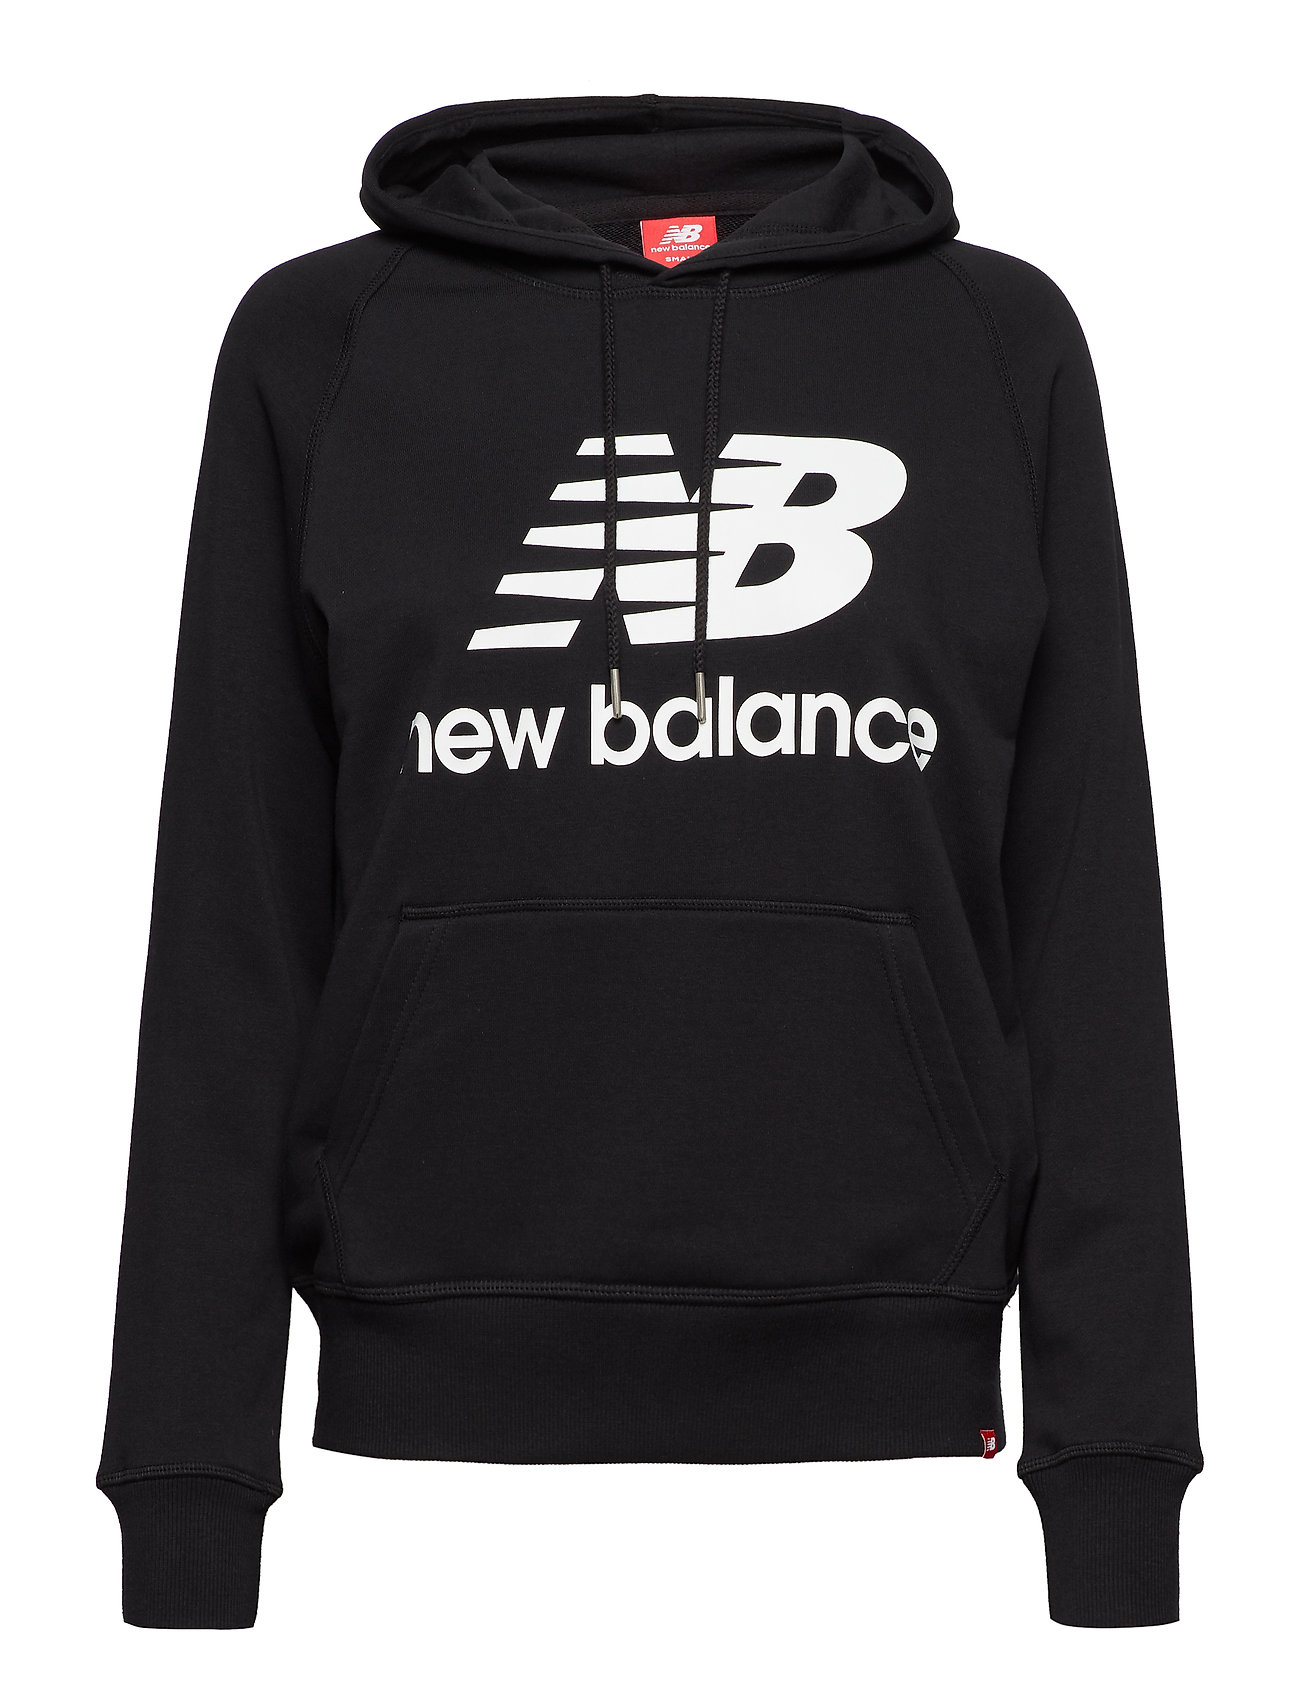 New Balance ESSENTIALS PULLOVER HOODIE - BLACK